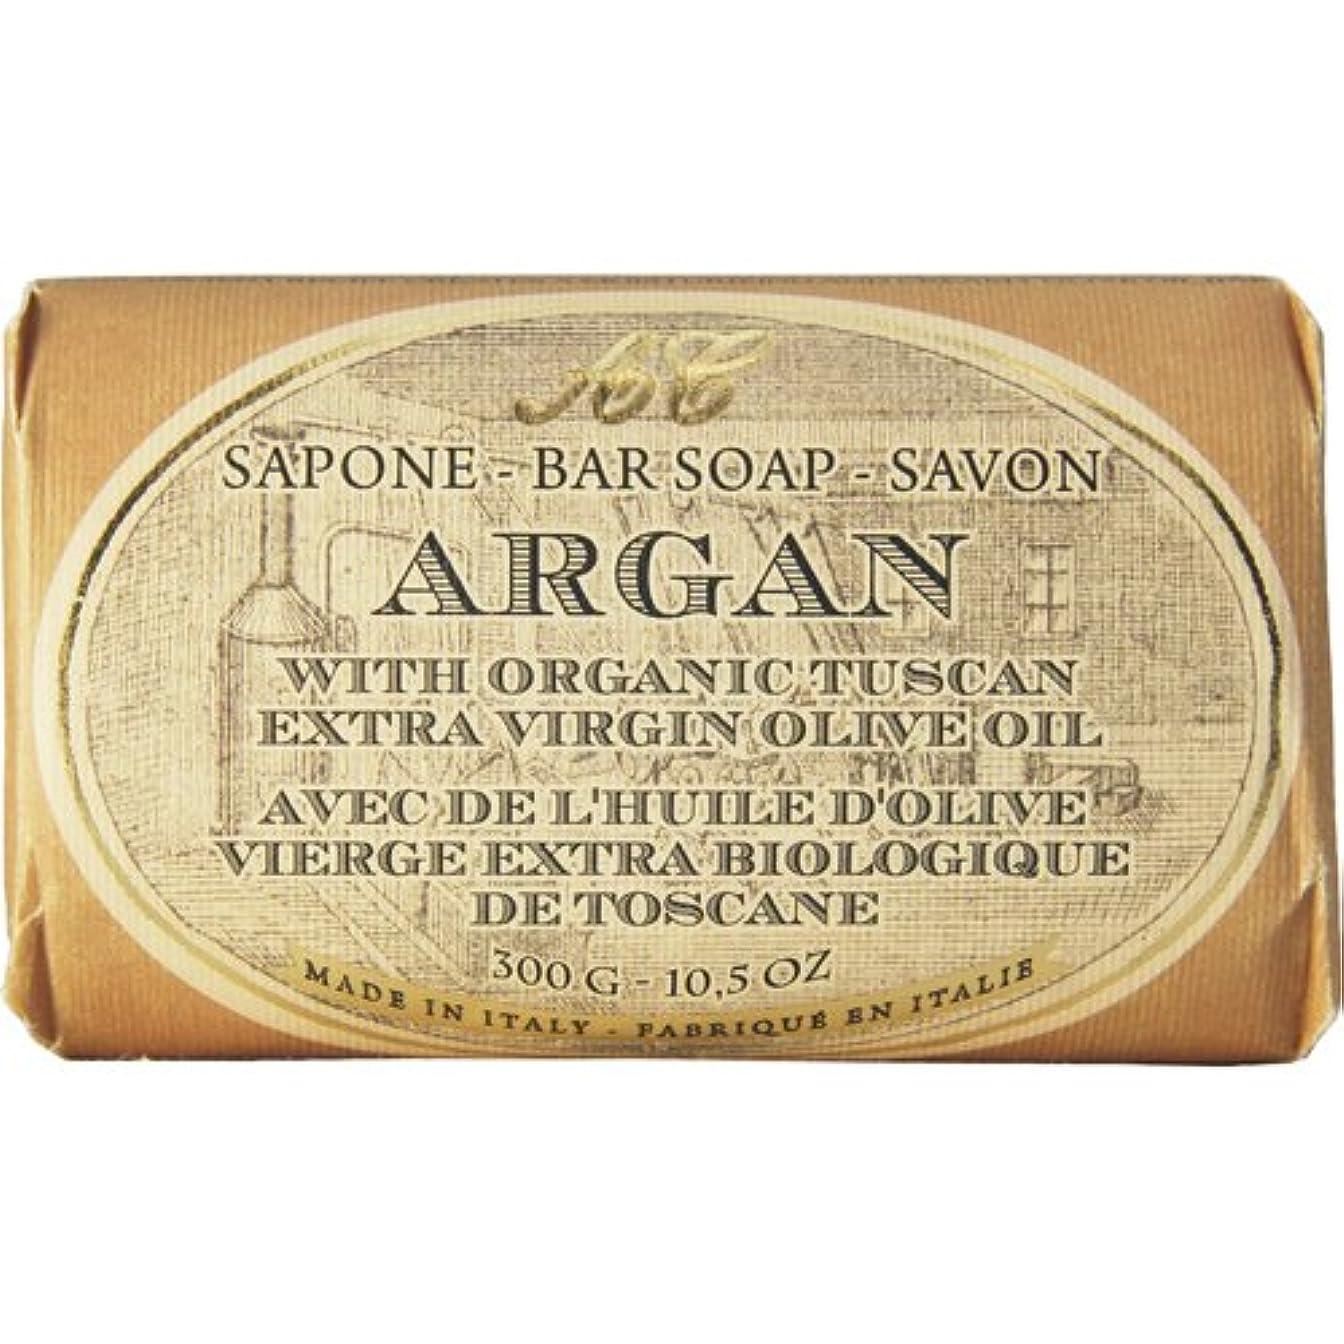 Saponerire Fissi レトロシリーズ Bar Soap バーソープ 300g Argan アルガンオイル